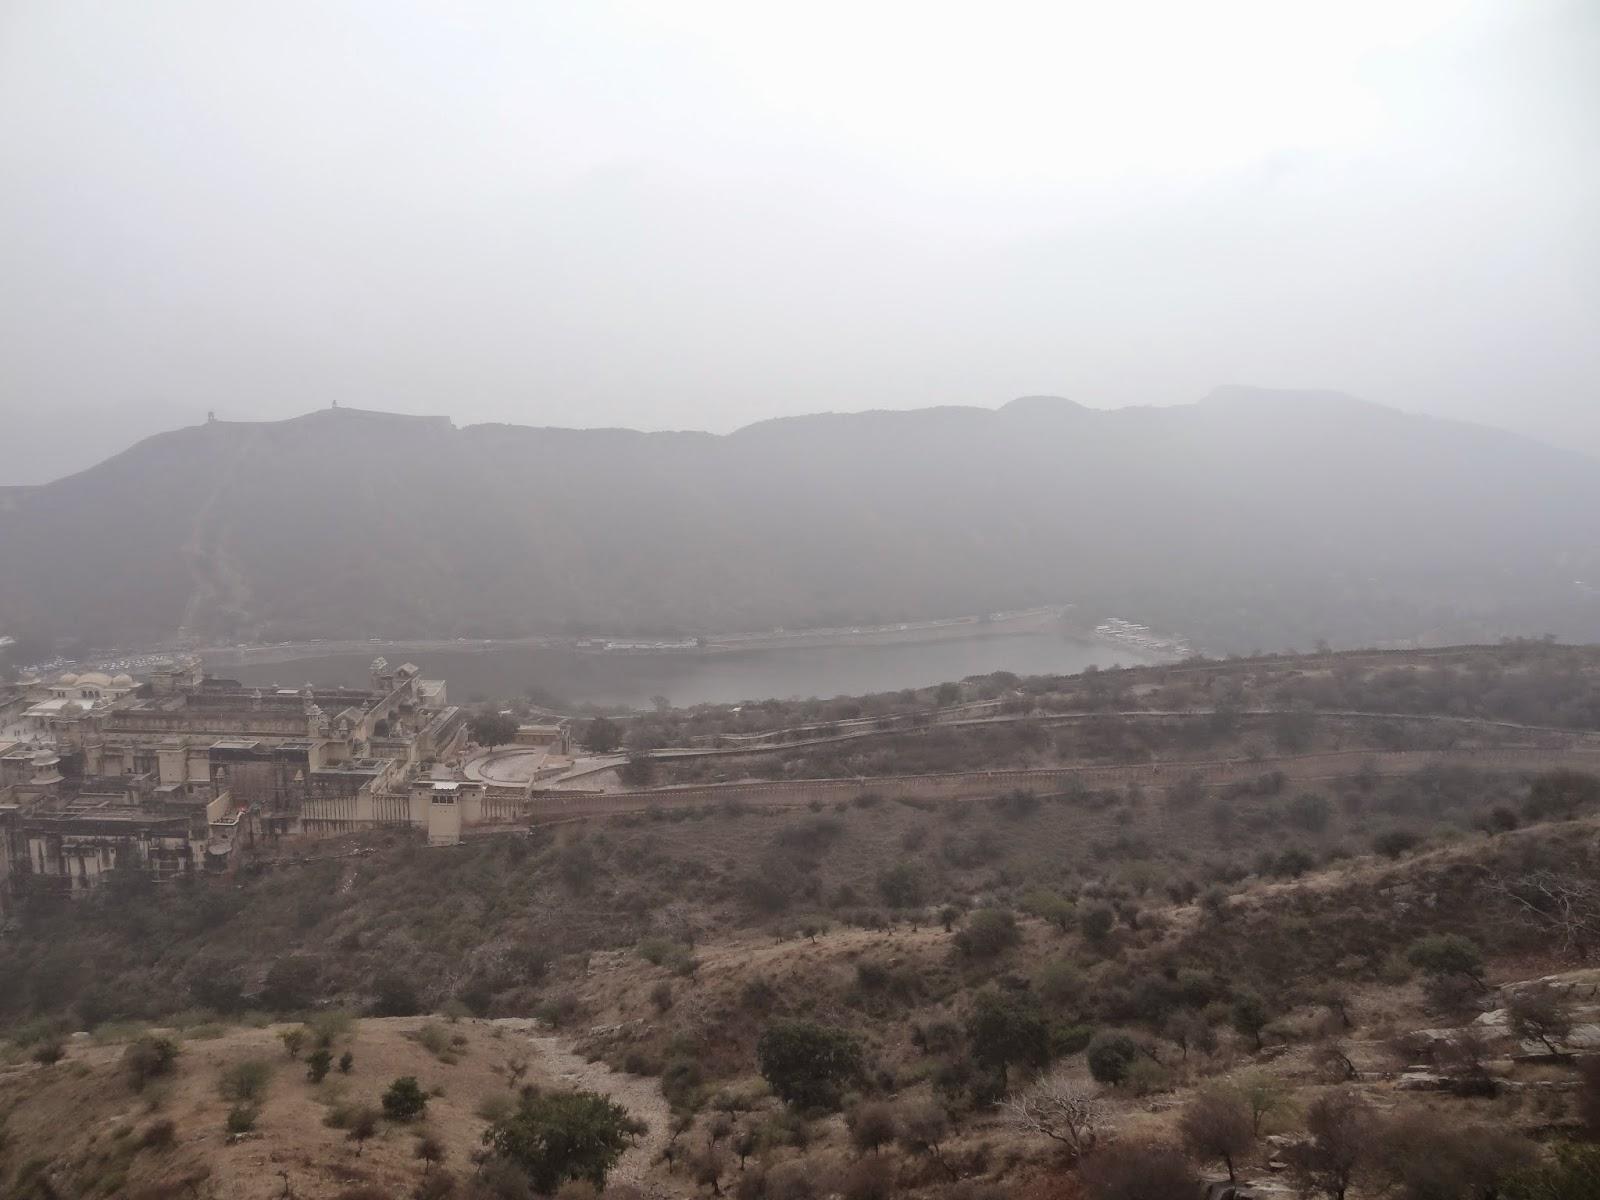 Jaigargh Fort - Jaipur Rajasthan India - Pick, Pack, Go